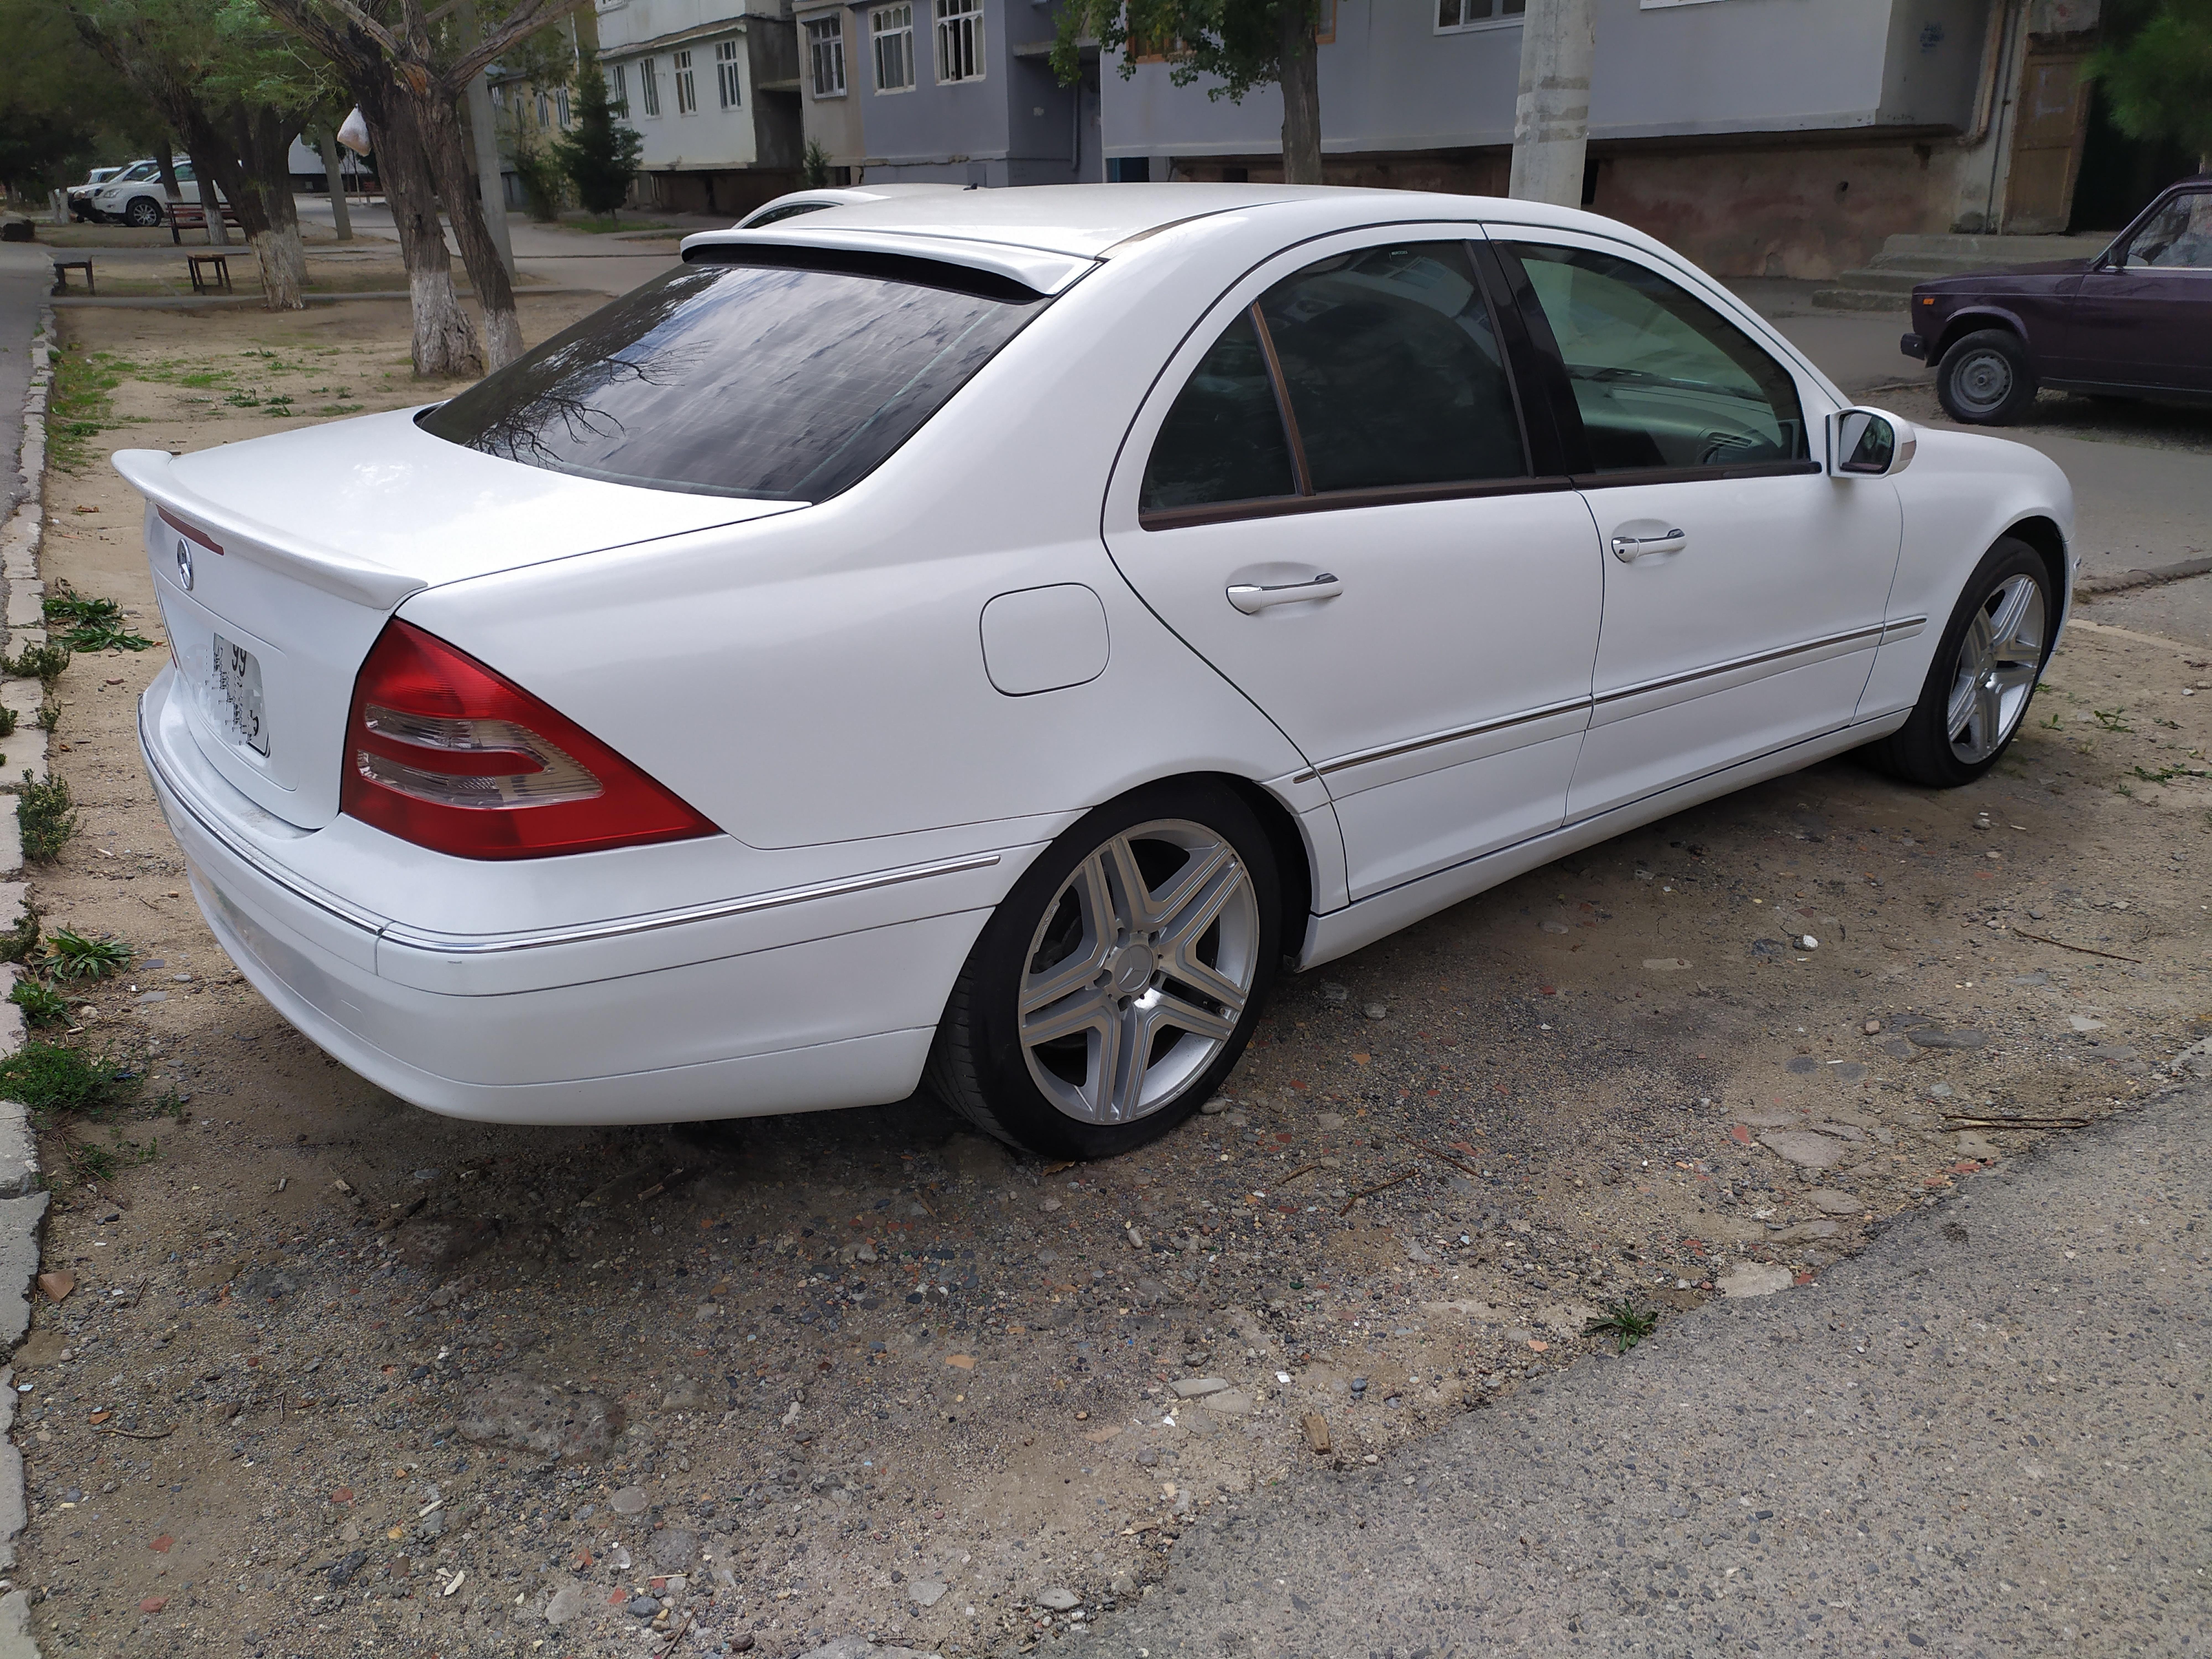 Mercedes-Benz C 200 2.0(lt) 2000 Second hand  $11500